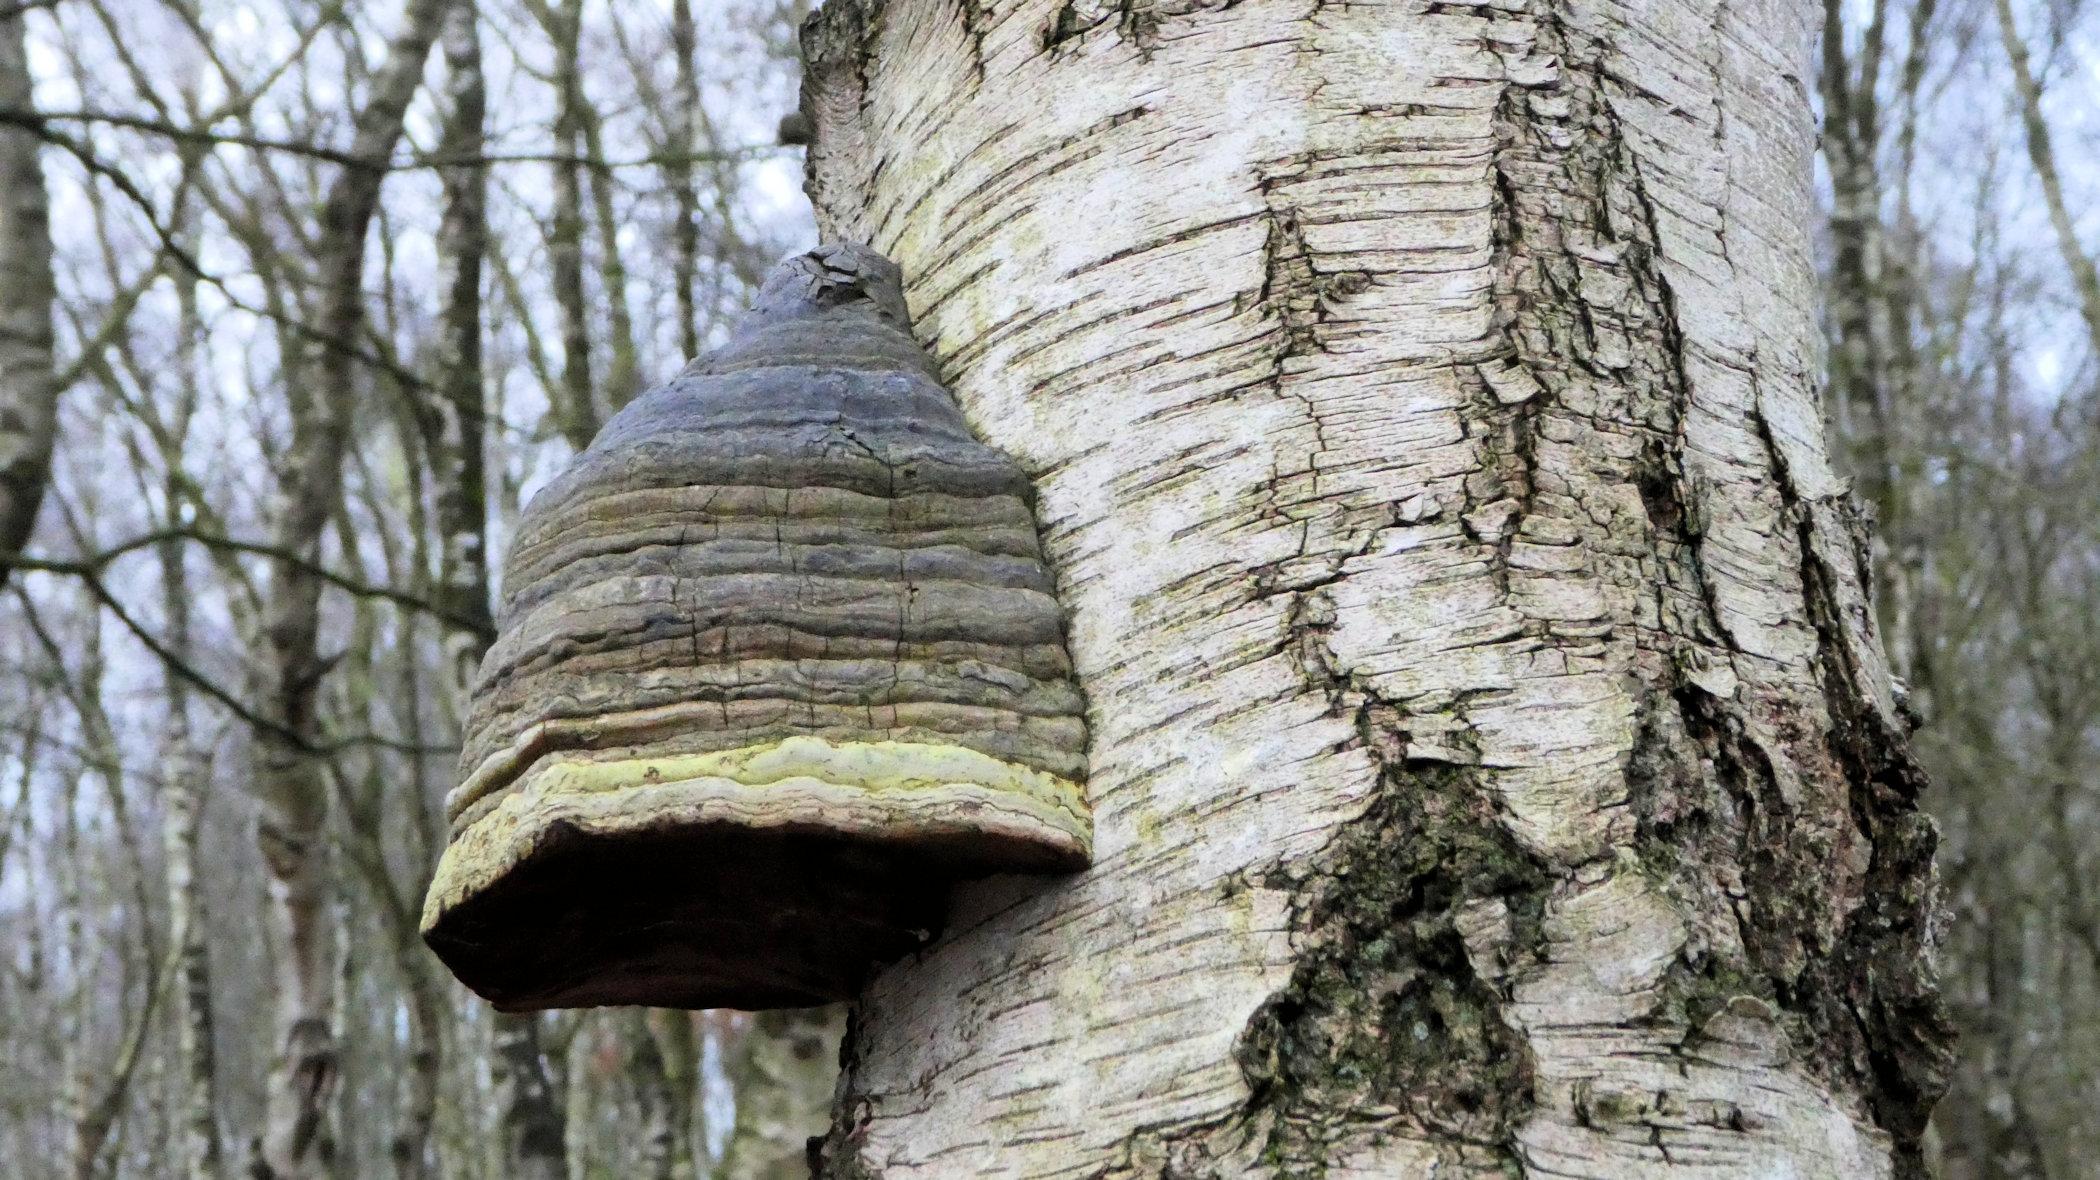 tinder fungus 1